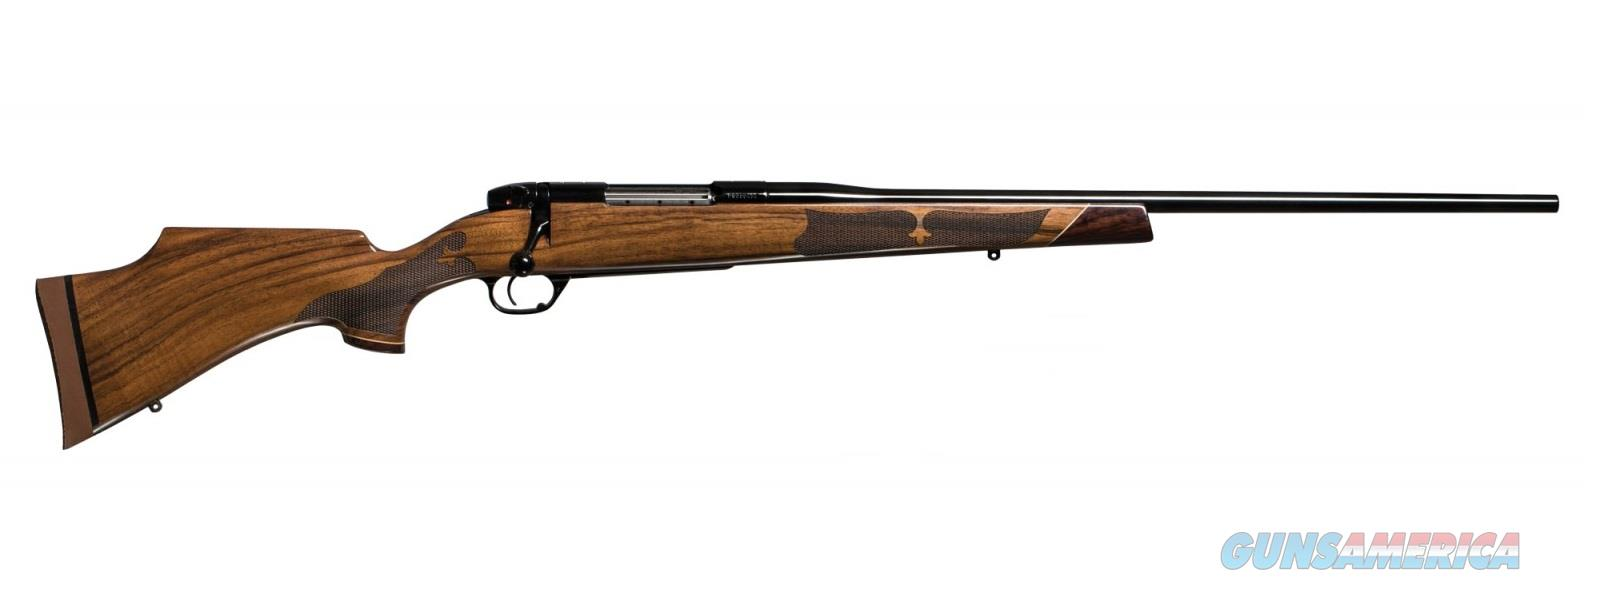 Weatherby MARKV CAMILLA 240WBY BL/WD 24 AA GLOSS AMERICAN WALNUT  Guns > Rifles > Weatherby Rifles > Sporting